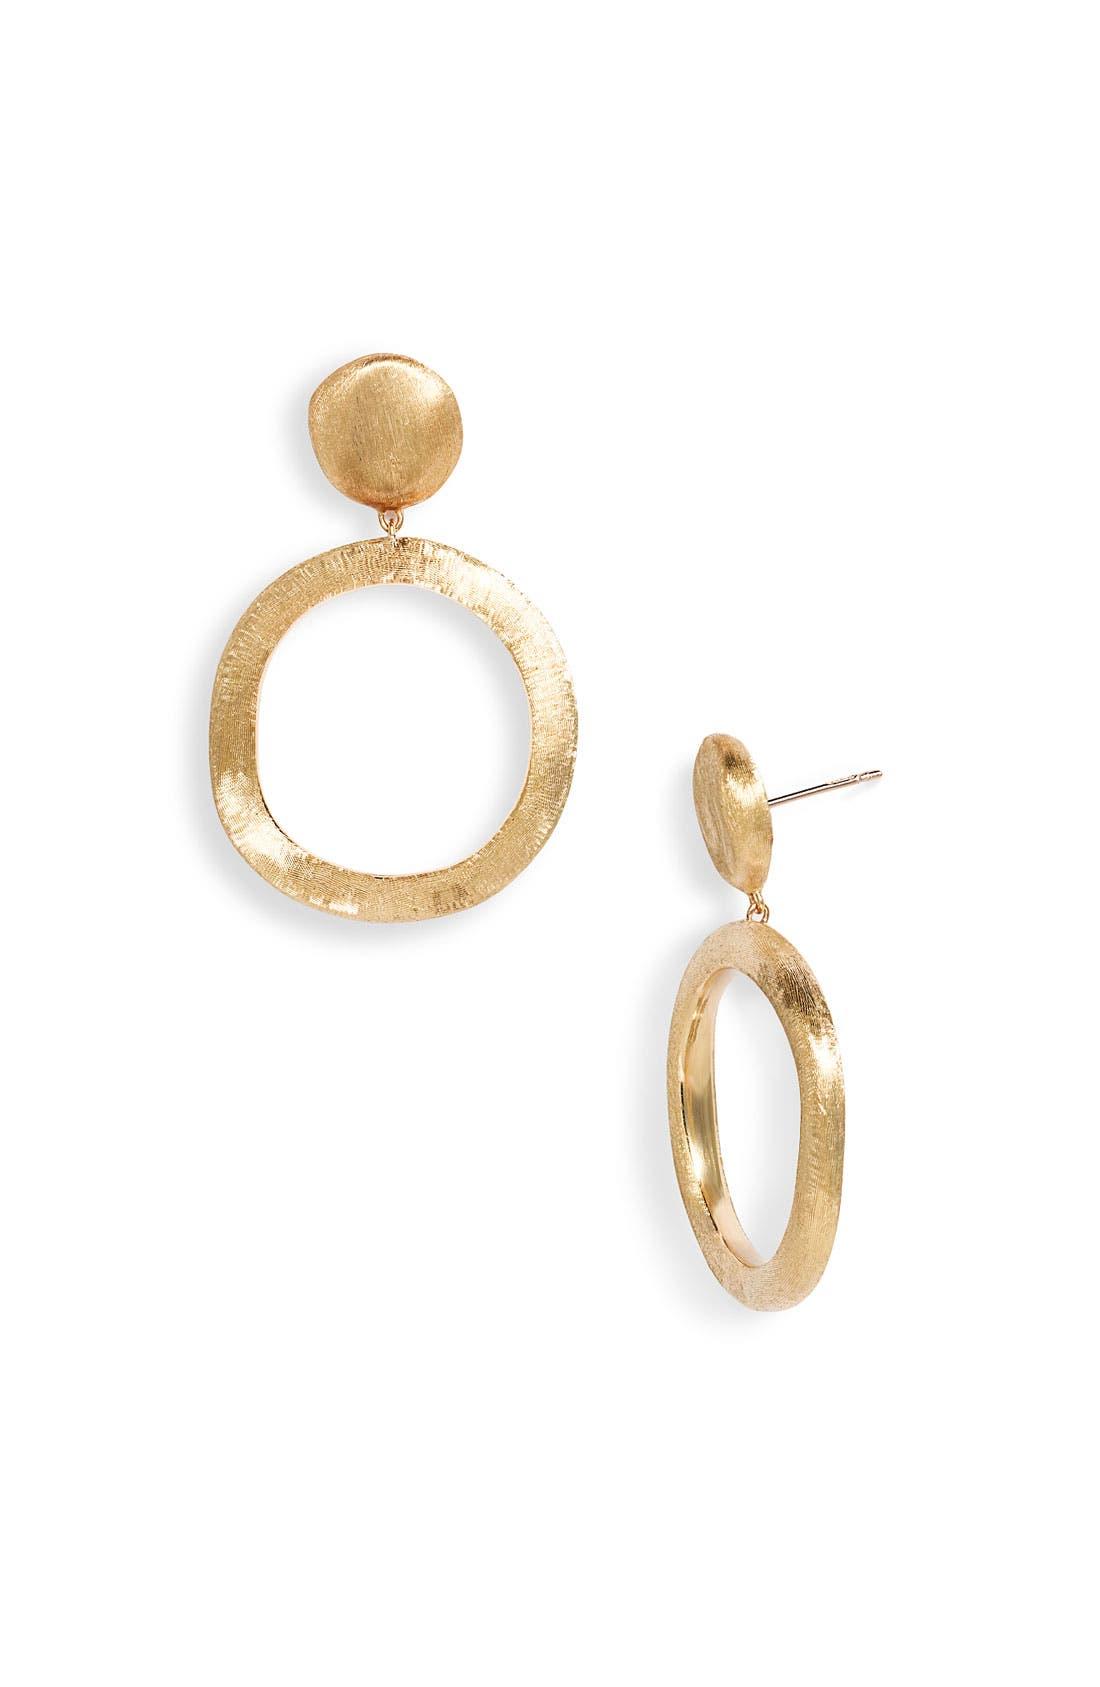 Main Image - Marco Bicego 'Jaipur' Large Drop Earrings